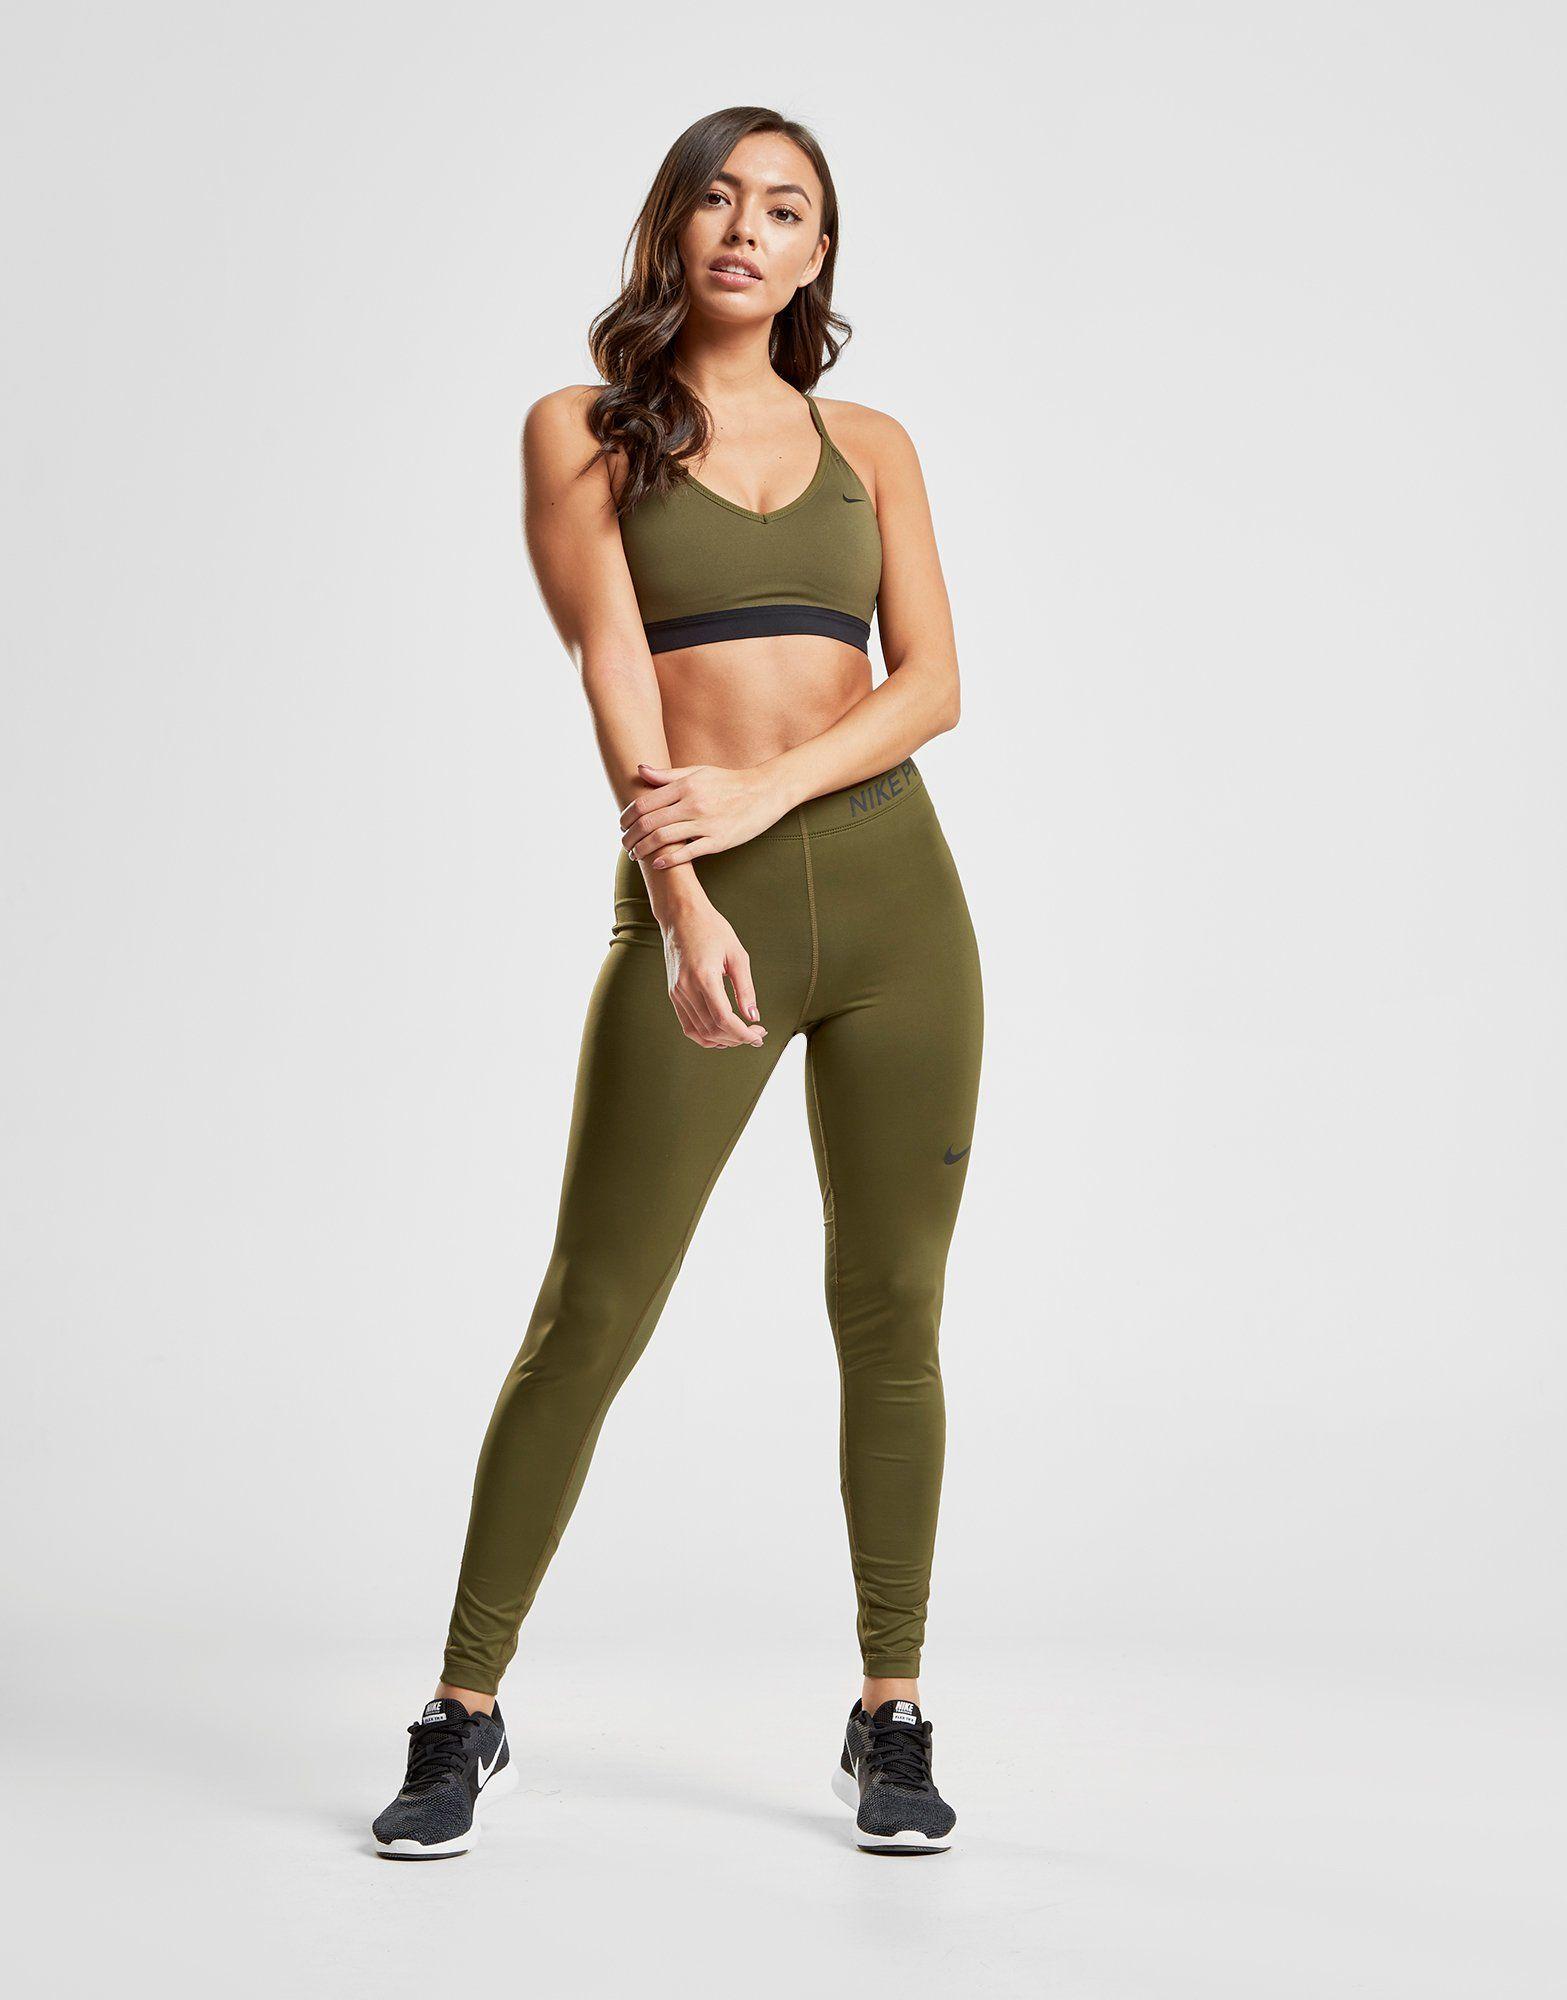 96d597462129d Nike Pro Training Leggings